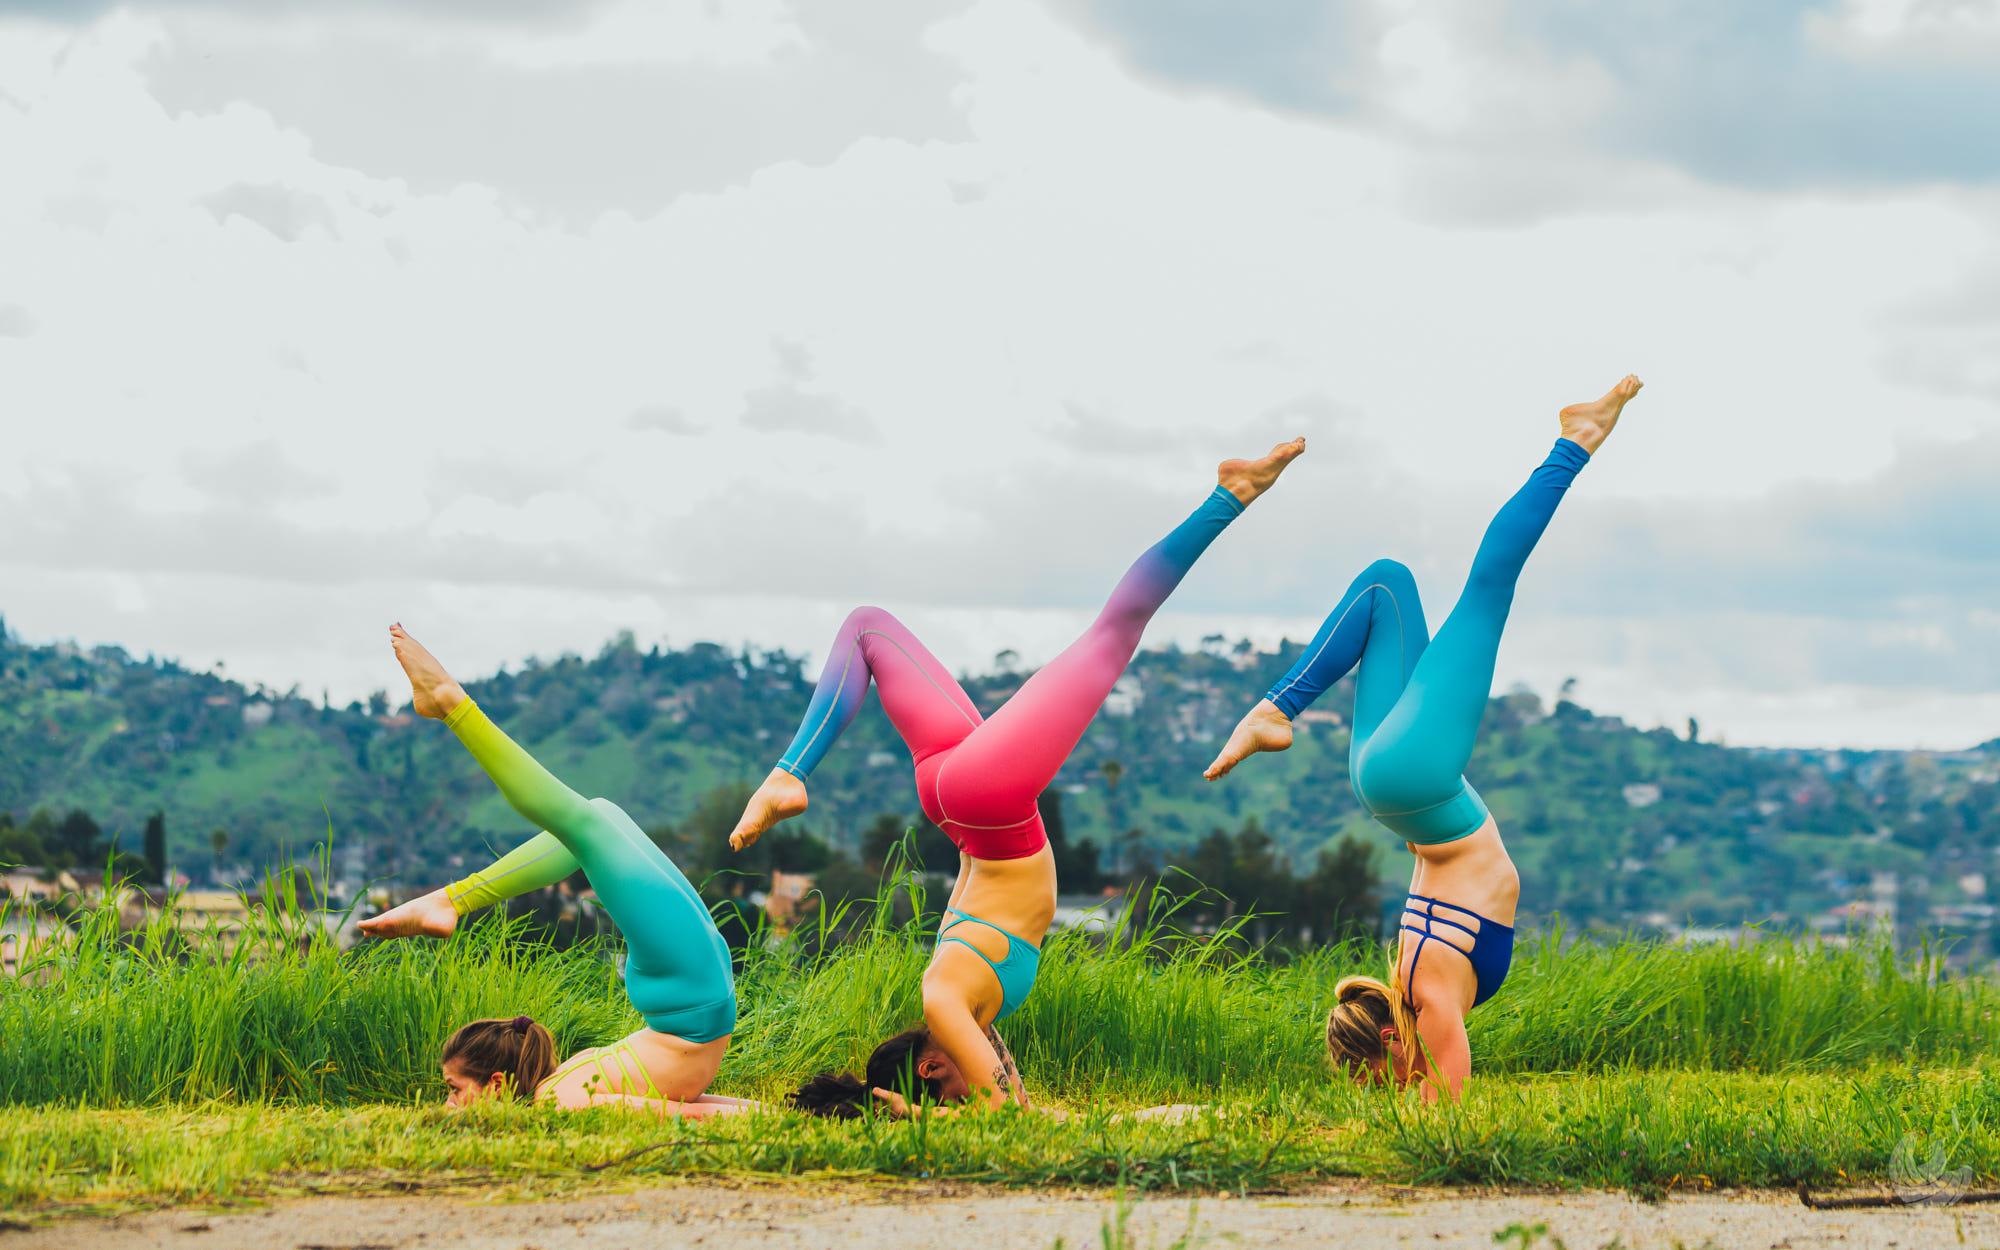 Wallpaper Women Model Yoga Pants Ponytail Nature 2000x1250 Lagito37 1275703 Hd Wallpapers Wallhere